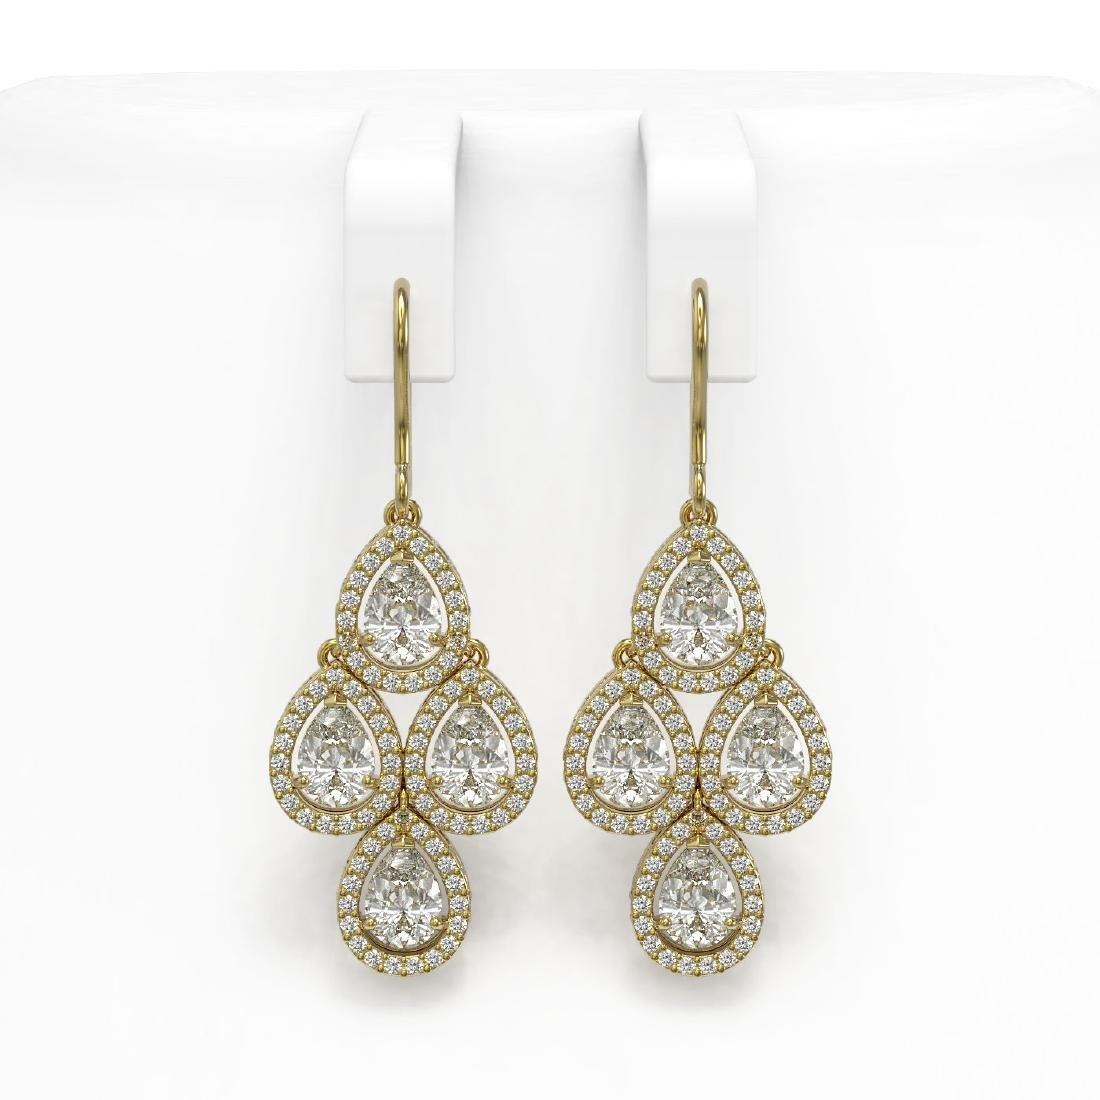 5.22 CTW Pear Diamond Designer Earrings 18K Yellow Gold